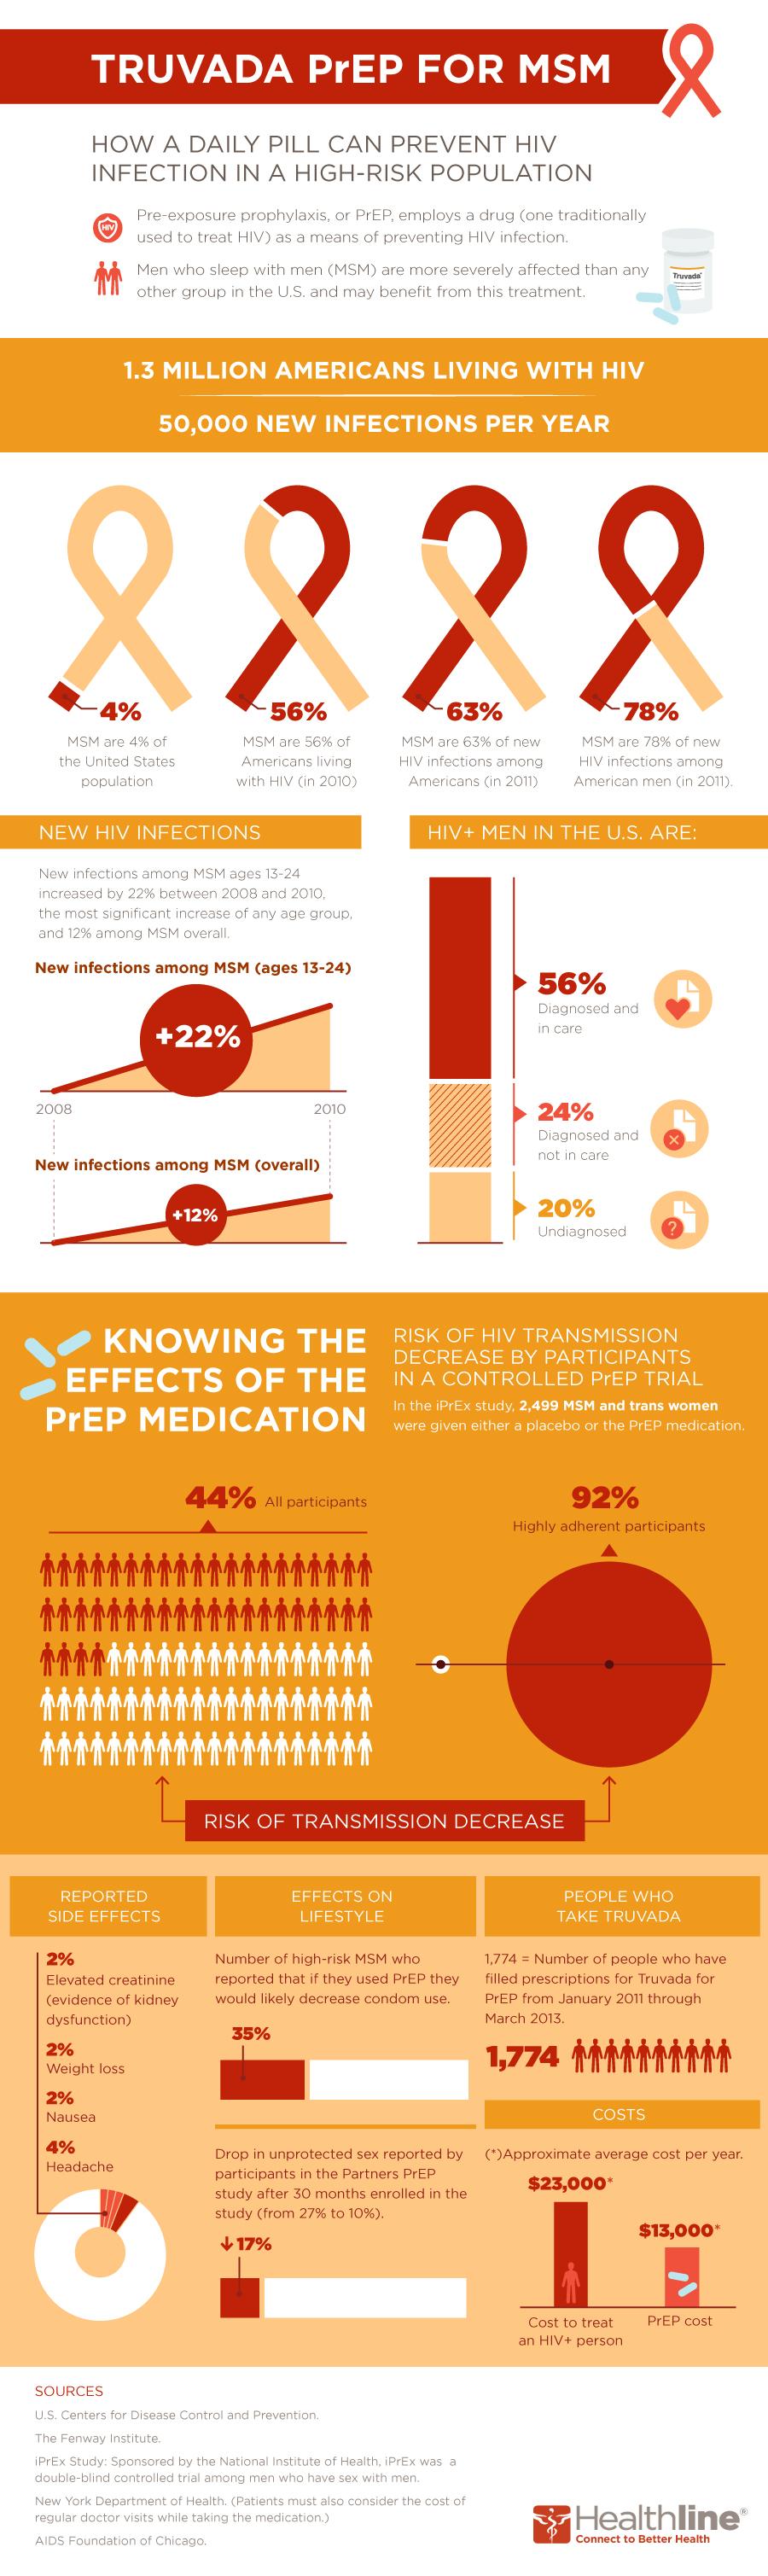 truvada healthline infographic